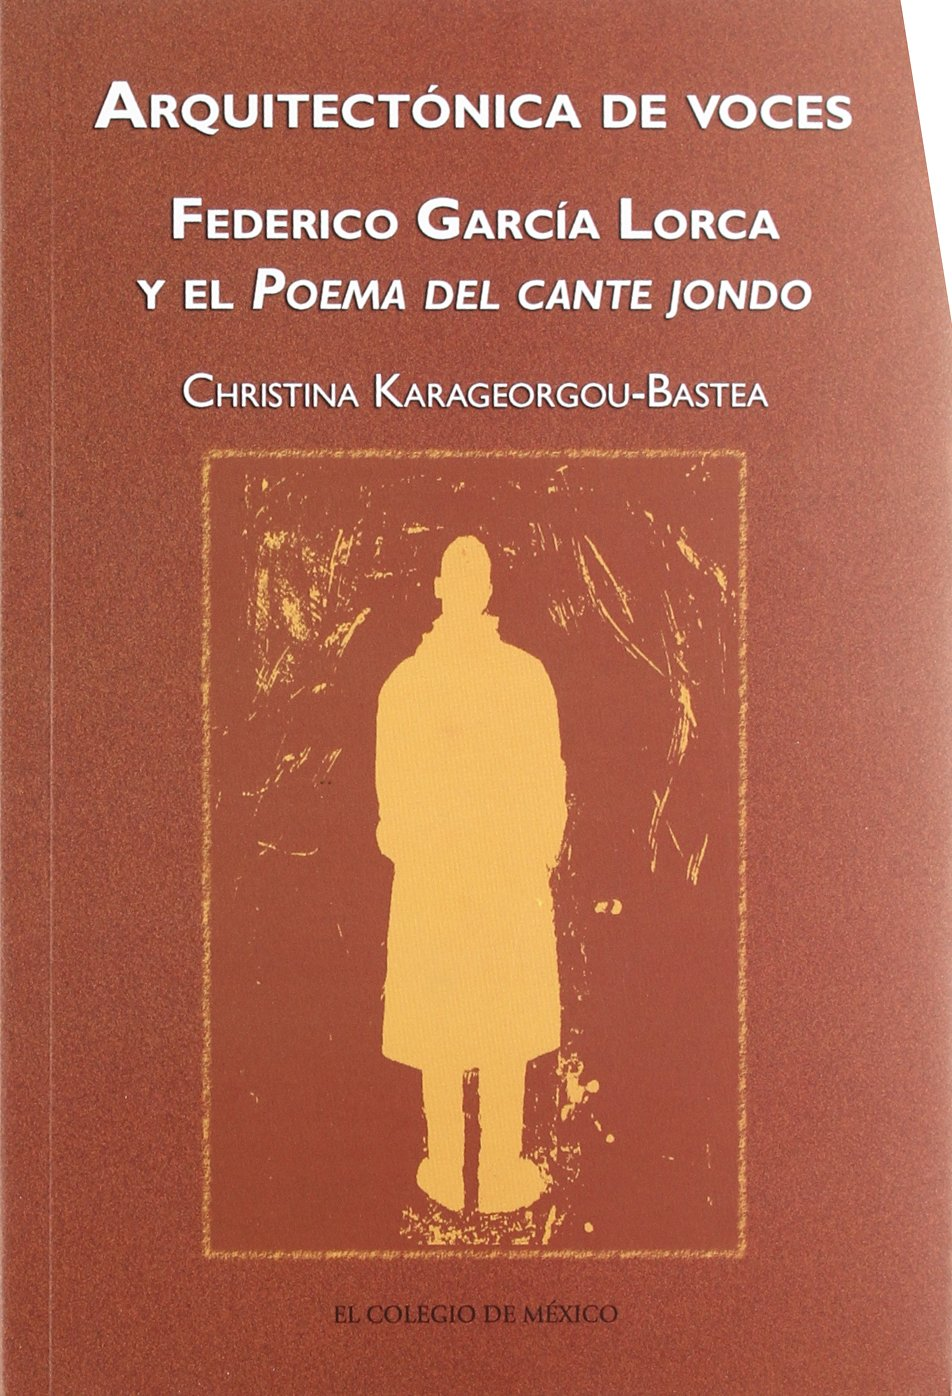 Arquitectonica de voces. Federico Garcia Lorca (Spanish Edition ...